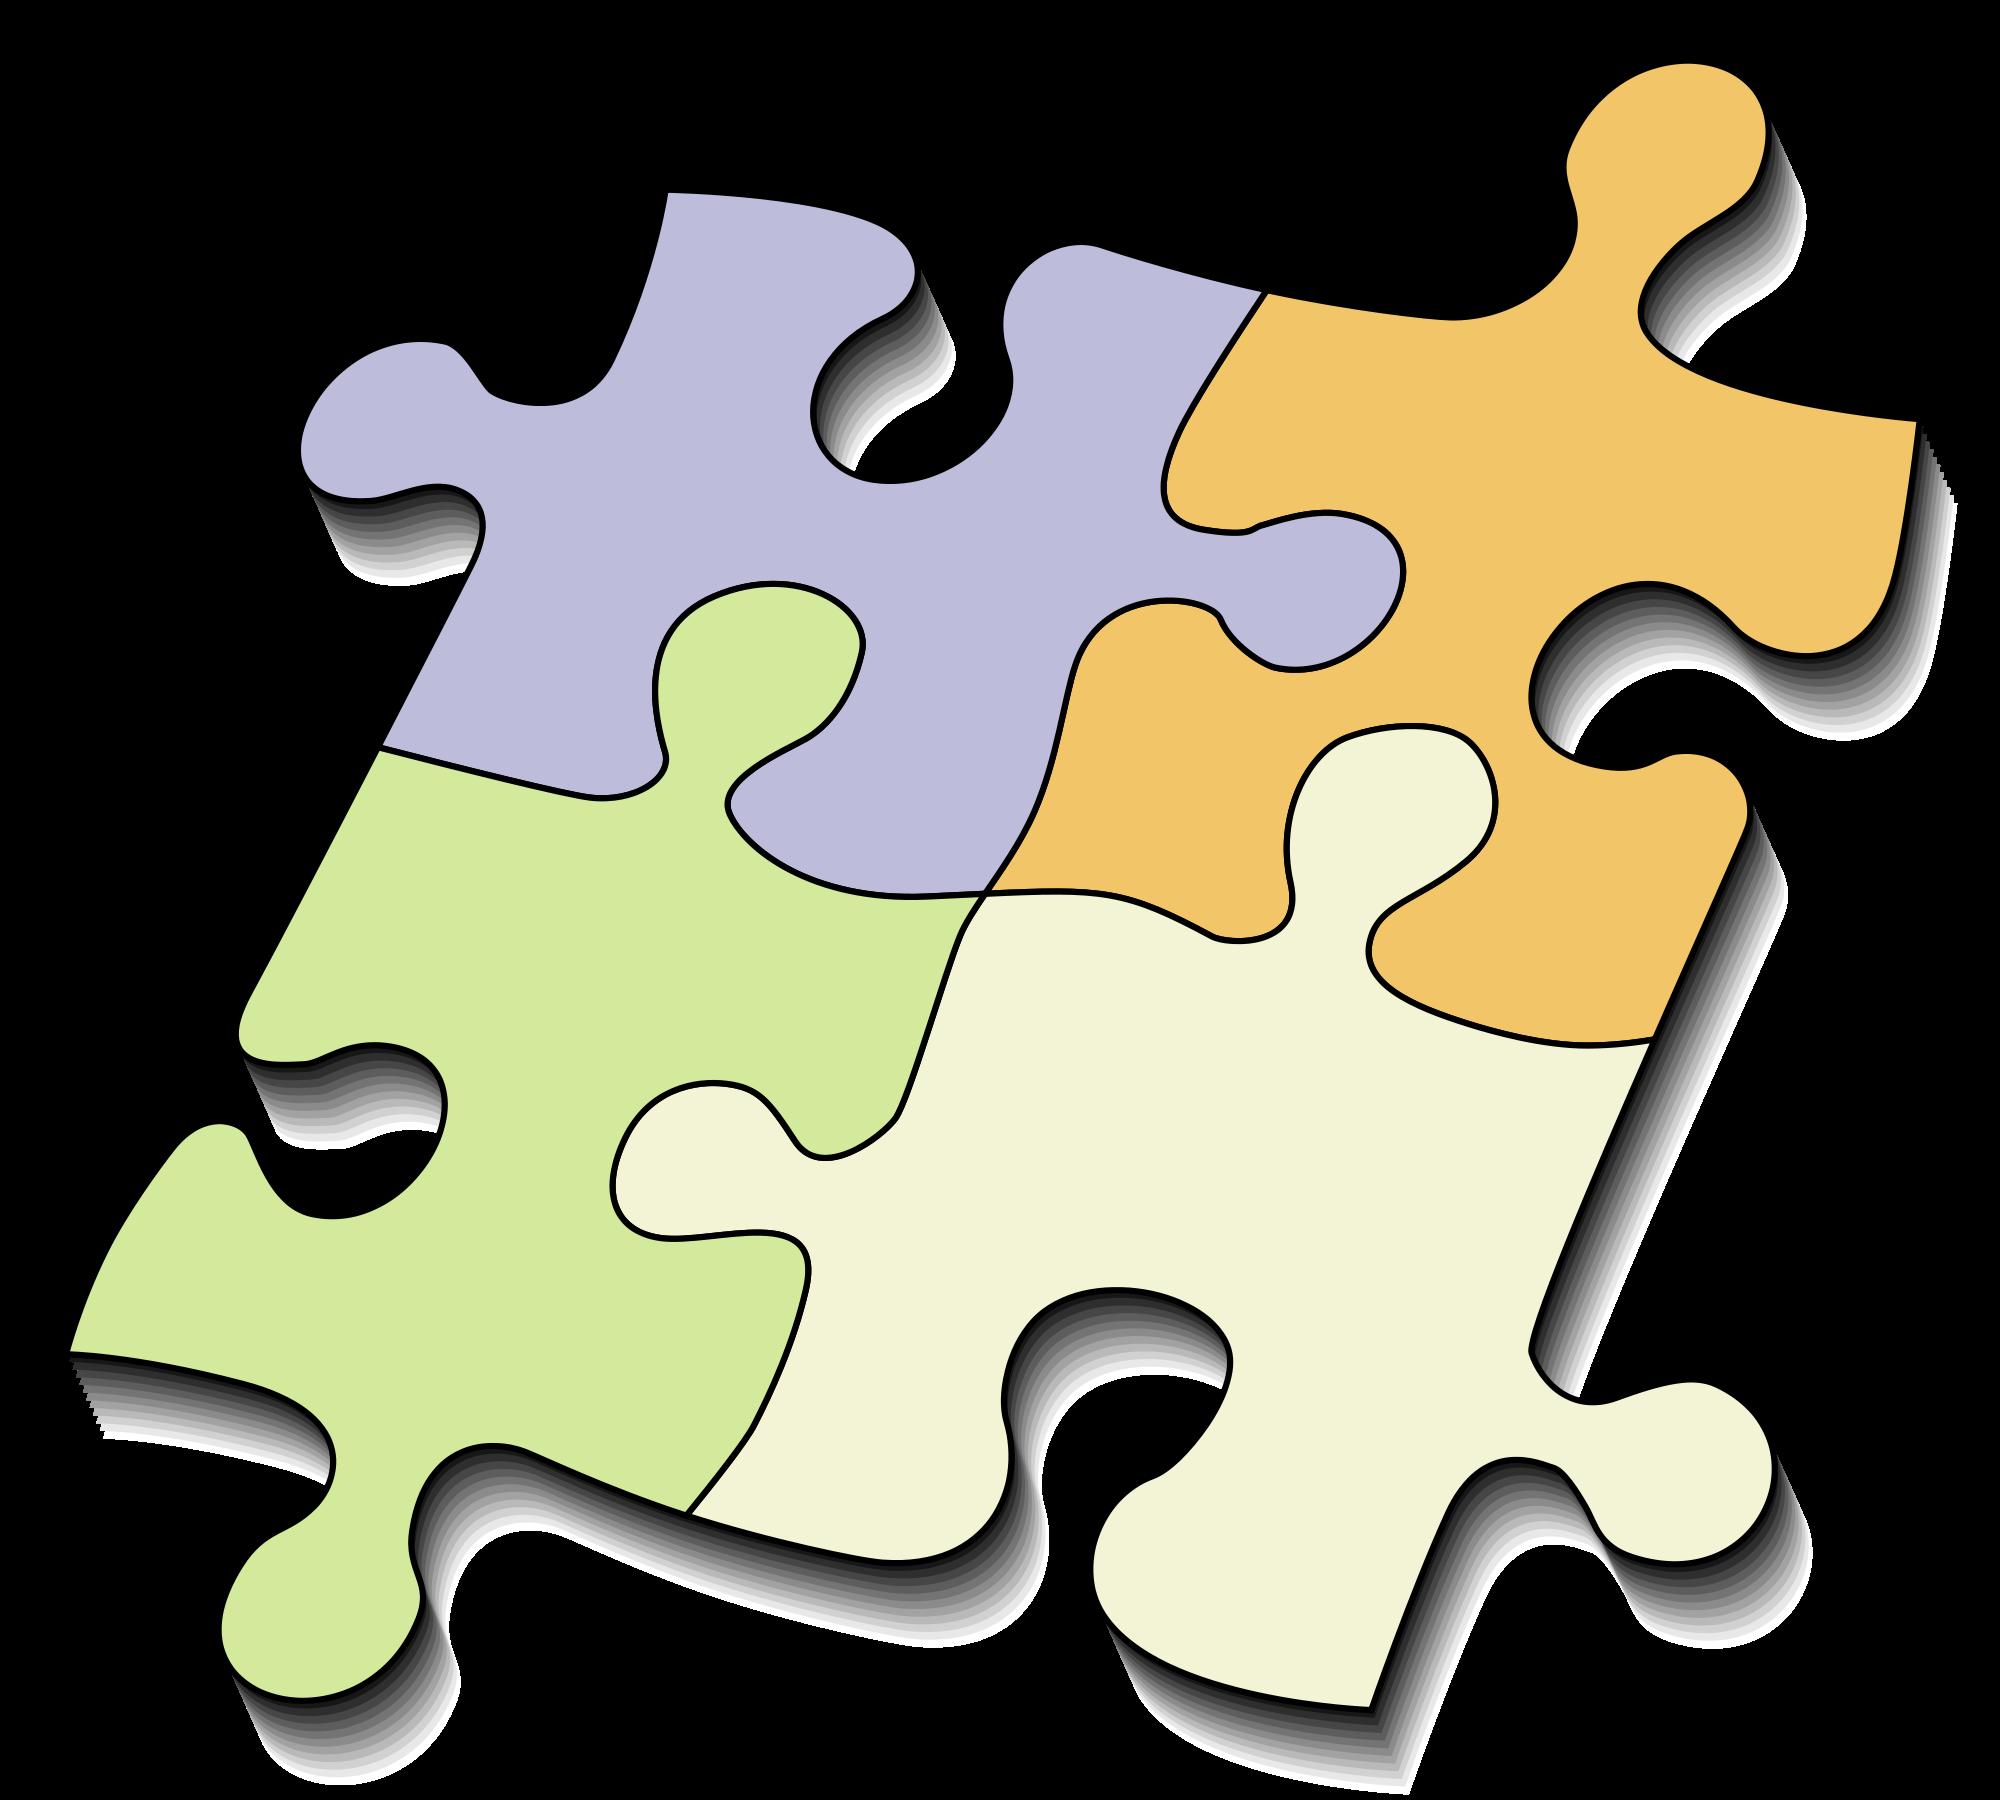 puzzle areas